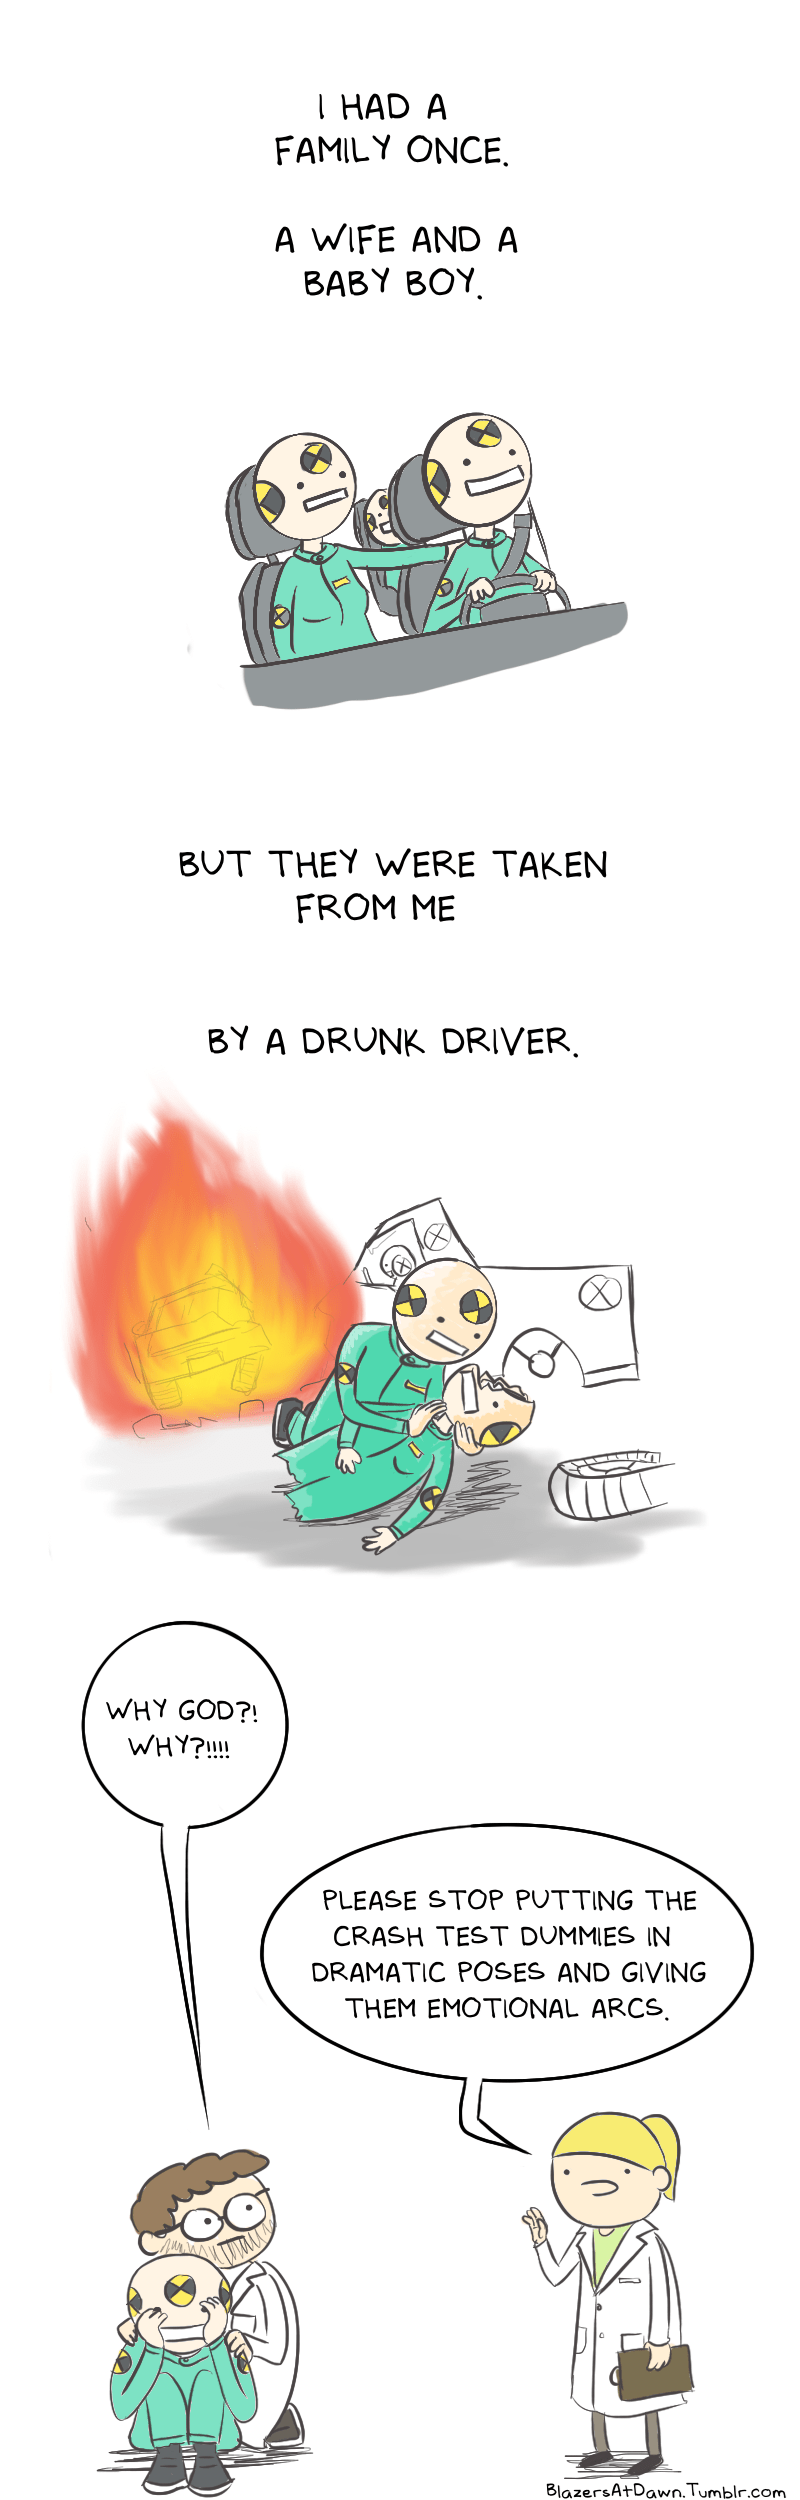 web comics crash test dummies It's Making These Crash Tests Feel Unethical